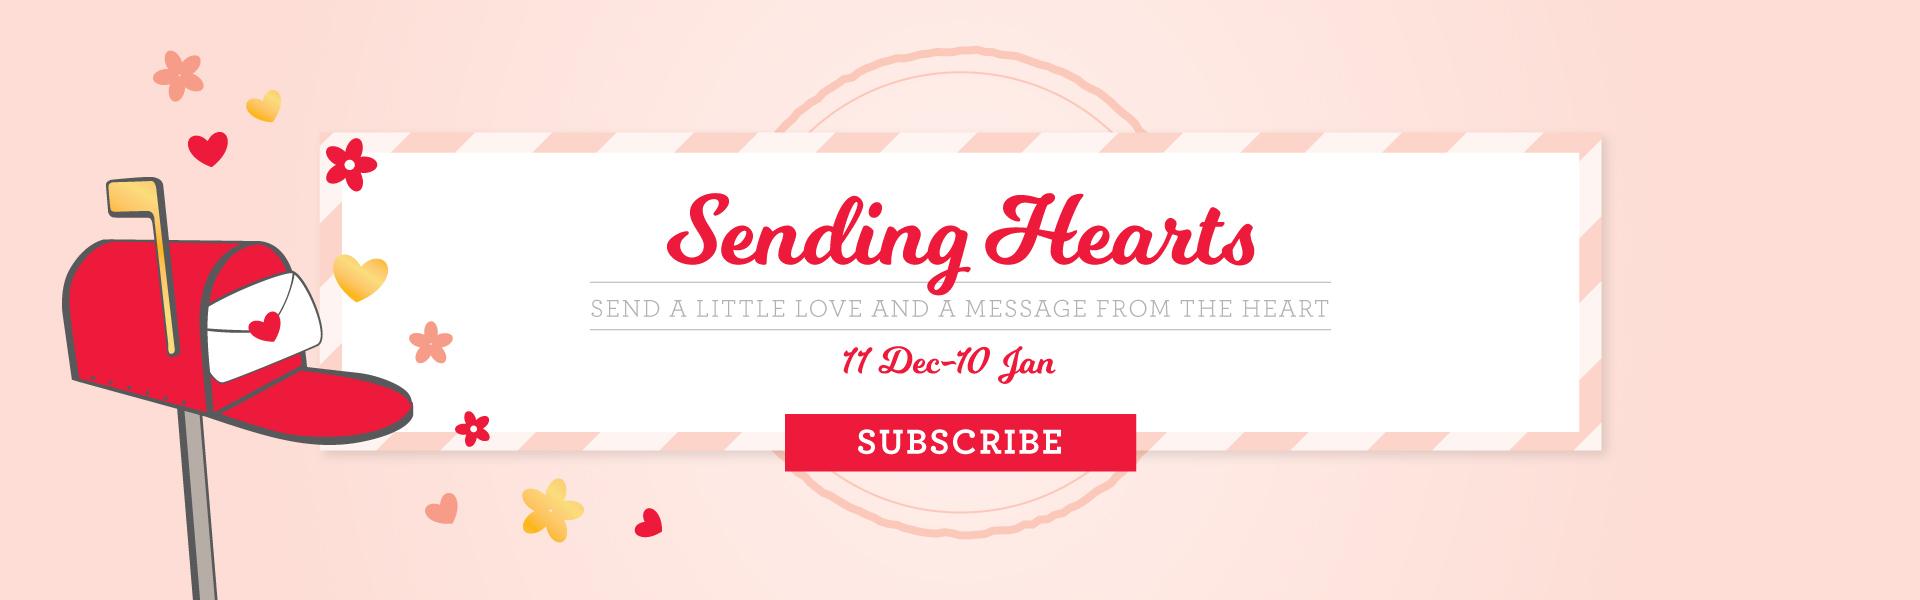 https://su-media.s3.amazonaws.com/media/Promotions/2021/PP-January-2021/1_Banner_Sending-Hearts_1920x600.jpg